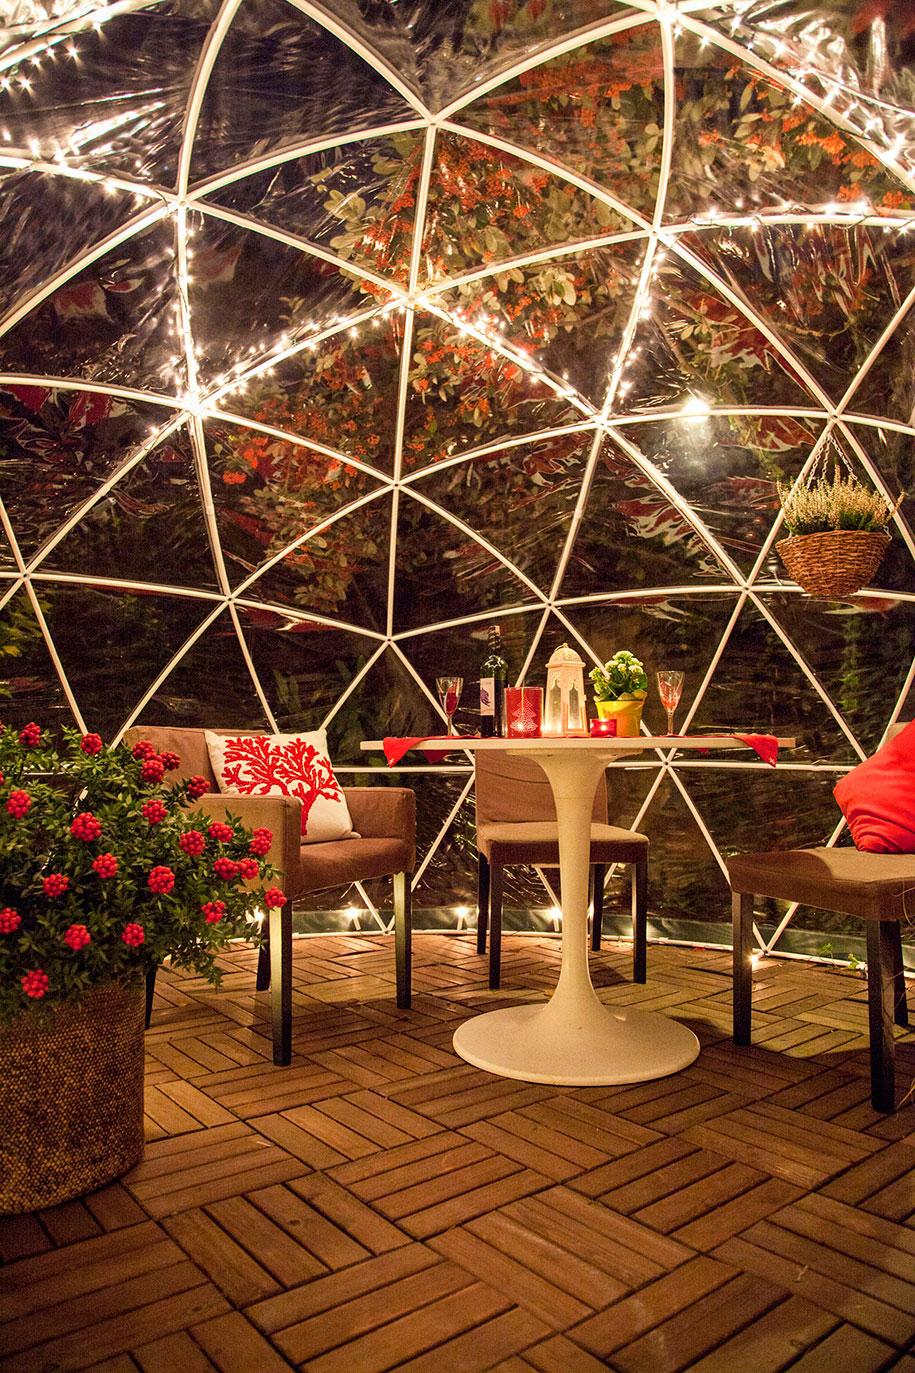 weatherproof-greenhouse-garden-igloos-gardenigloo-12